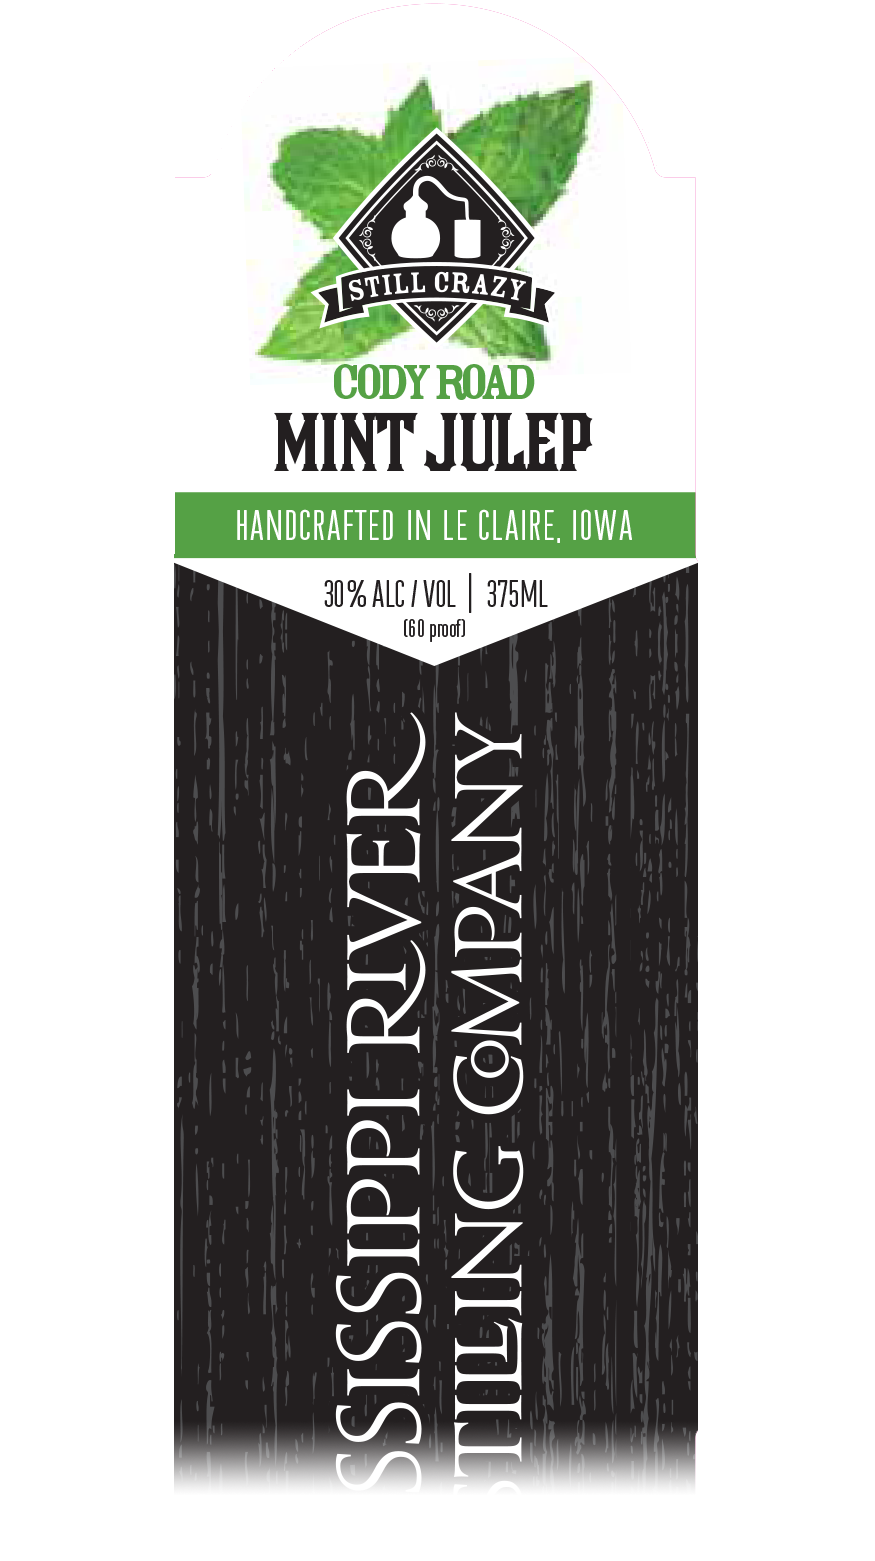 Cody Road Mint Julep label